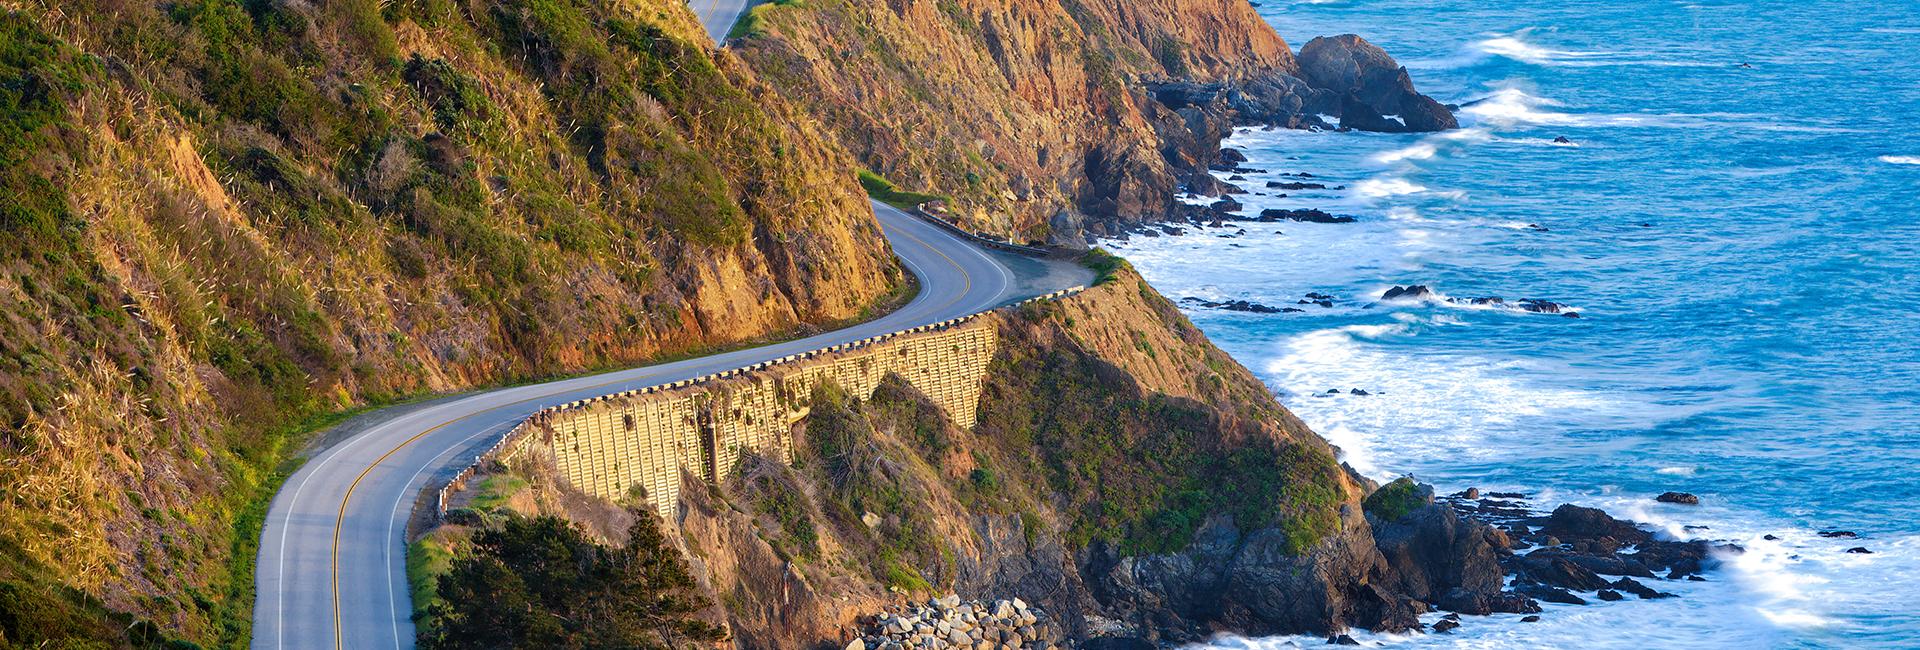 california coast -slide 1 v2